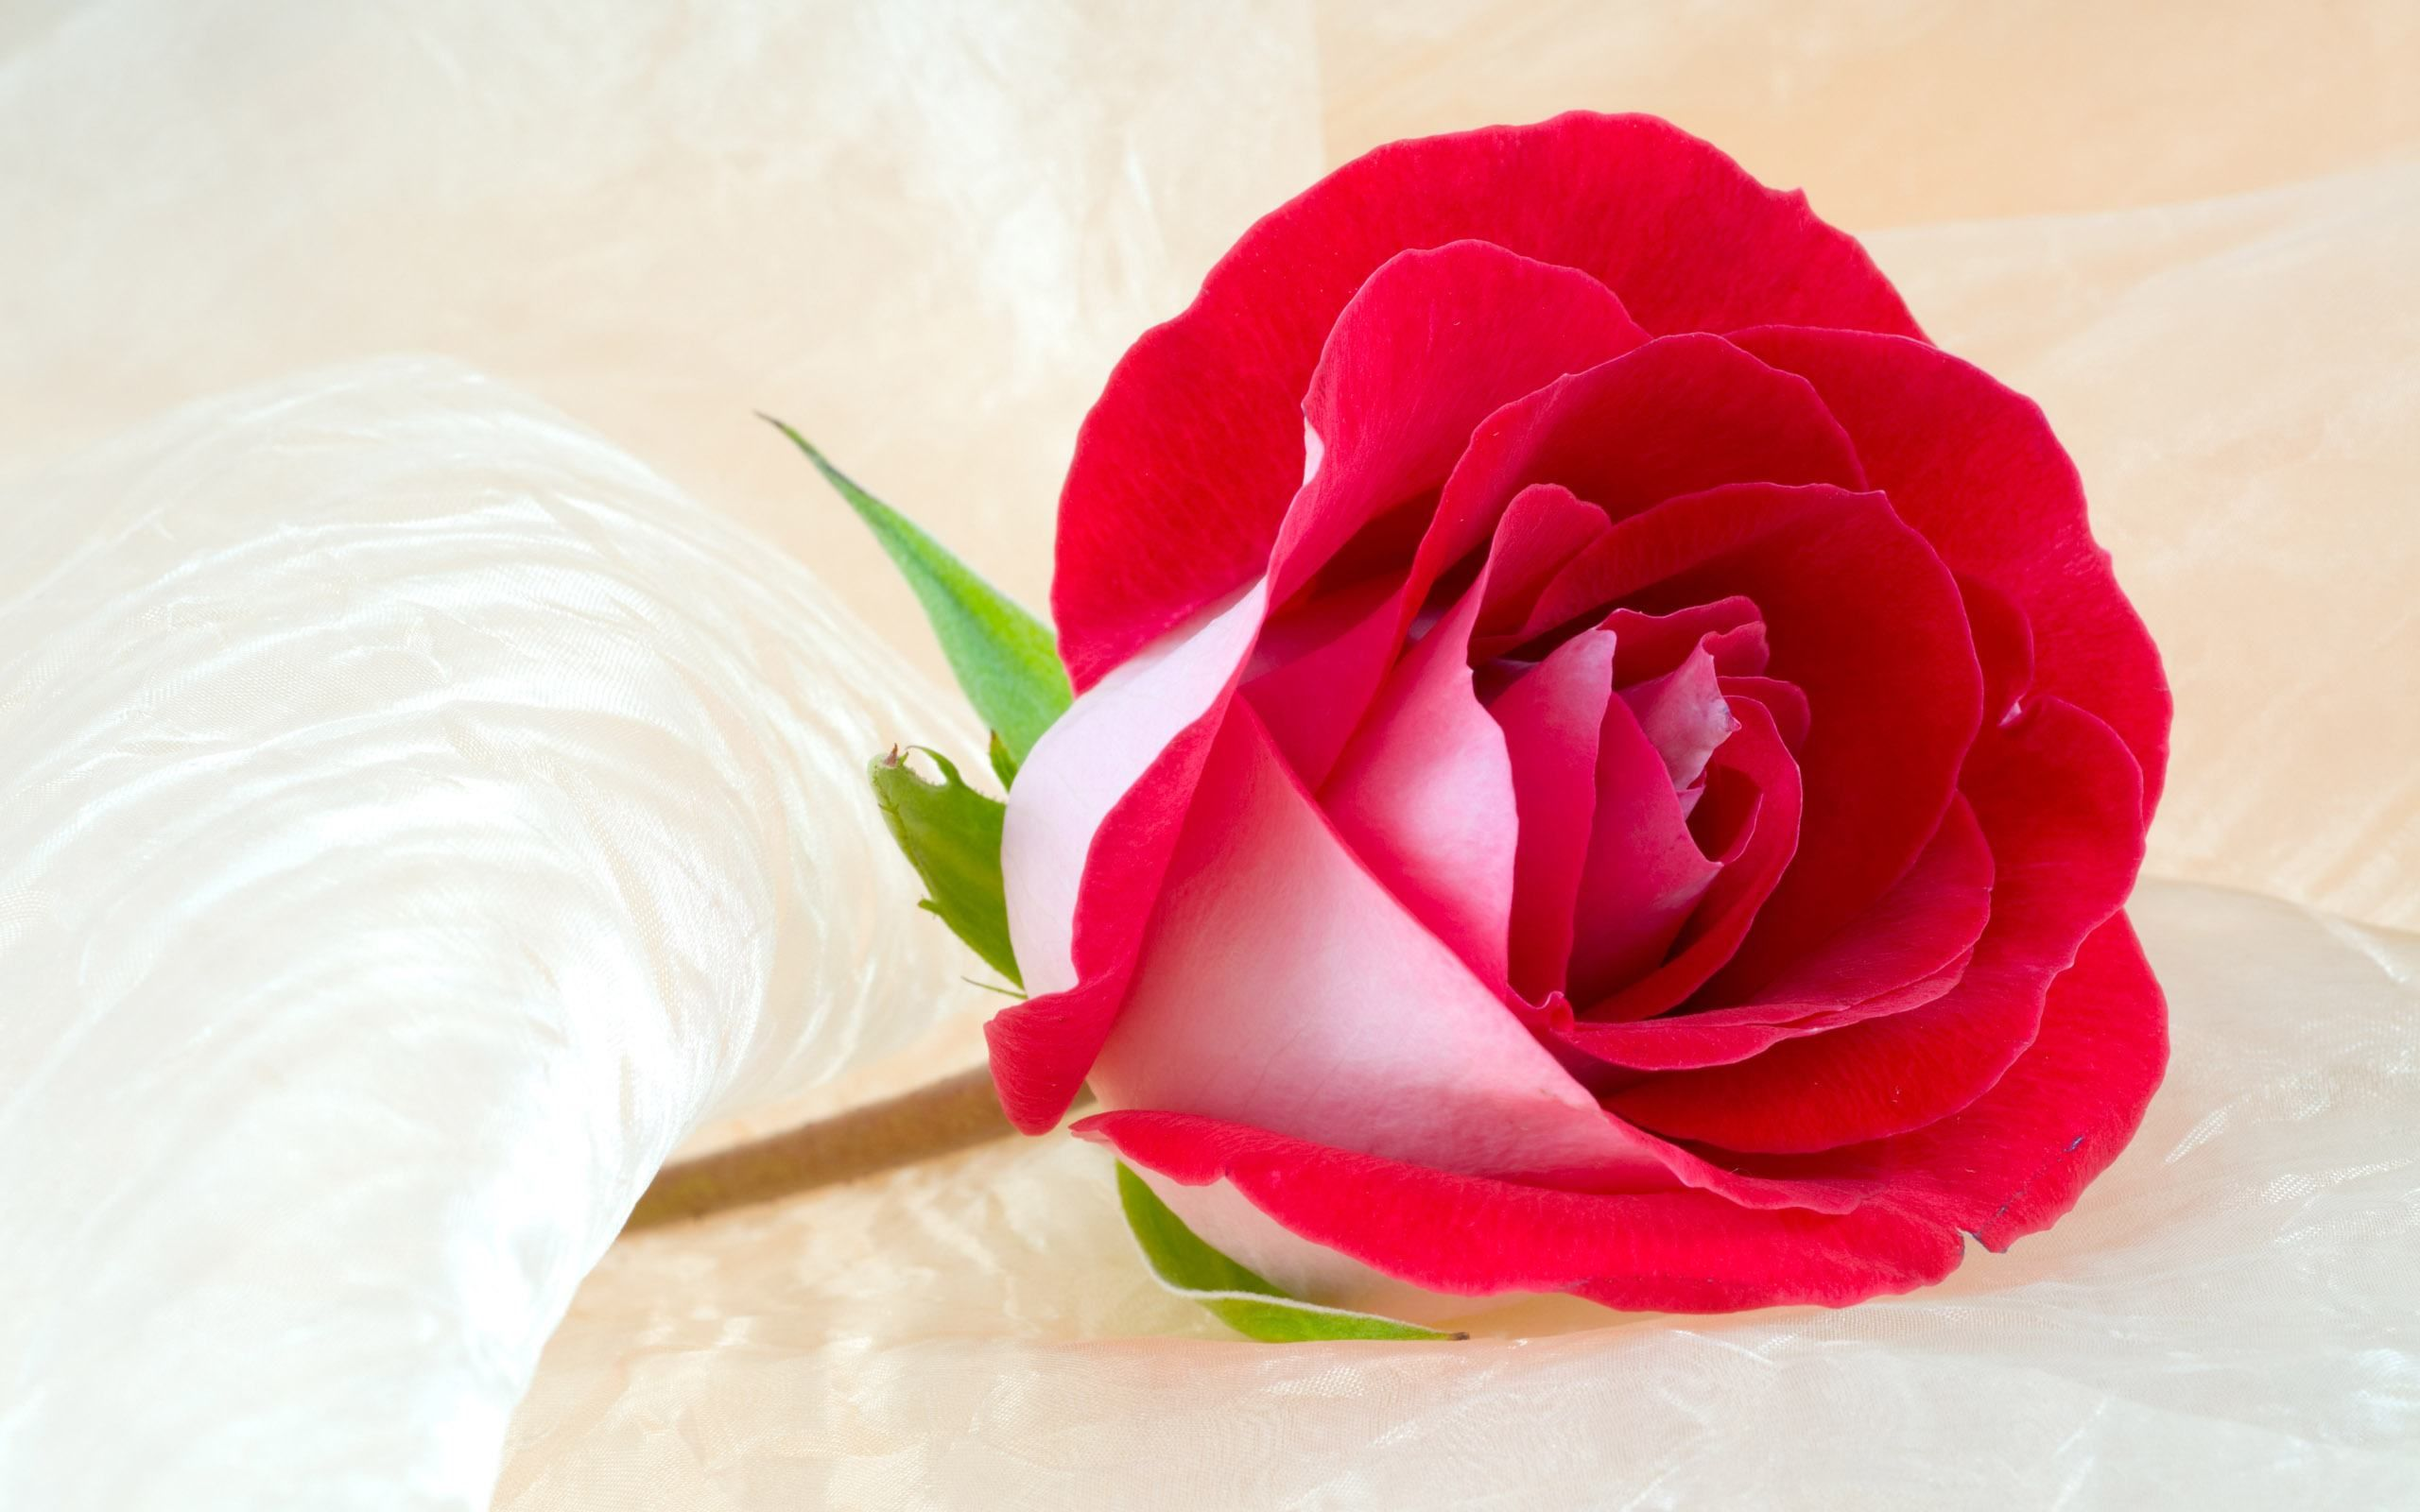 Rose Flower Wallpaper Hd Free Download